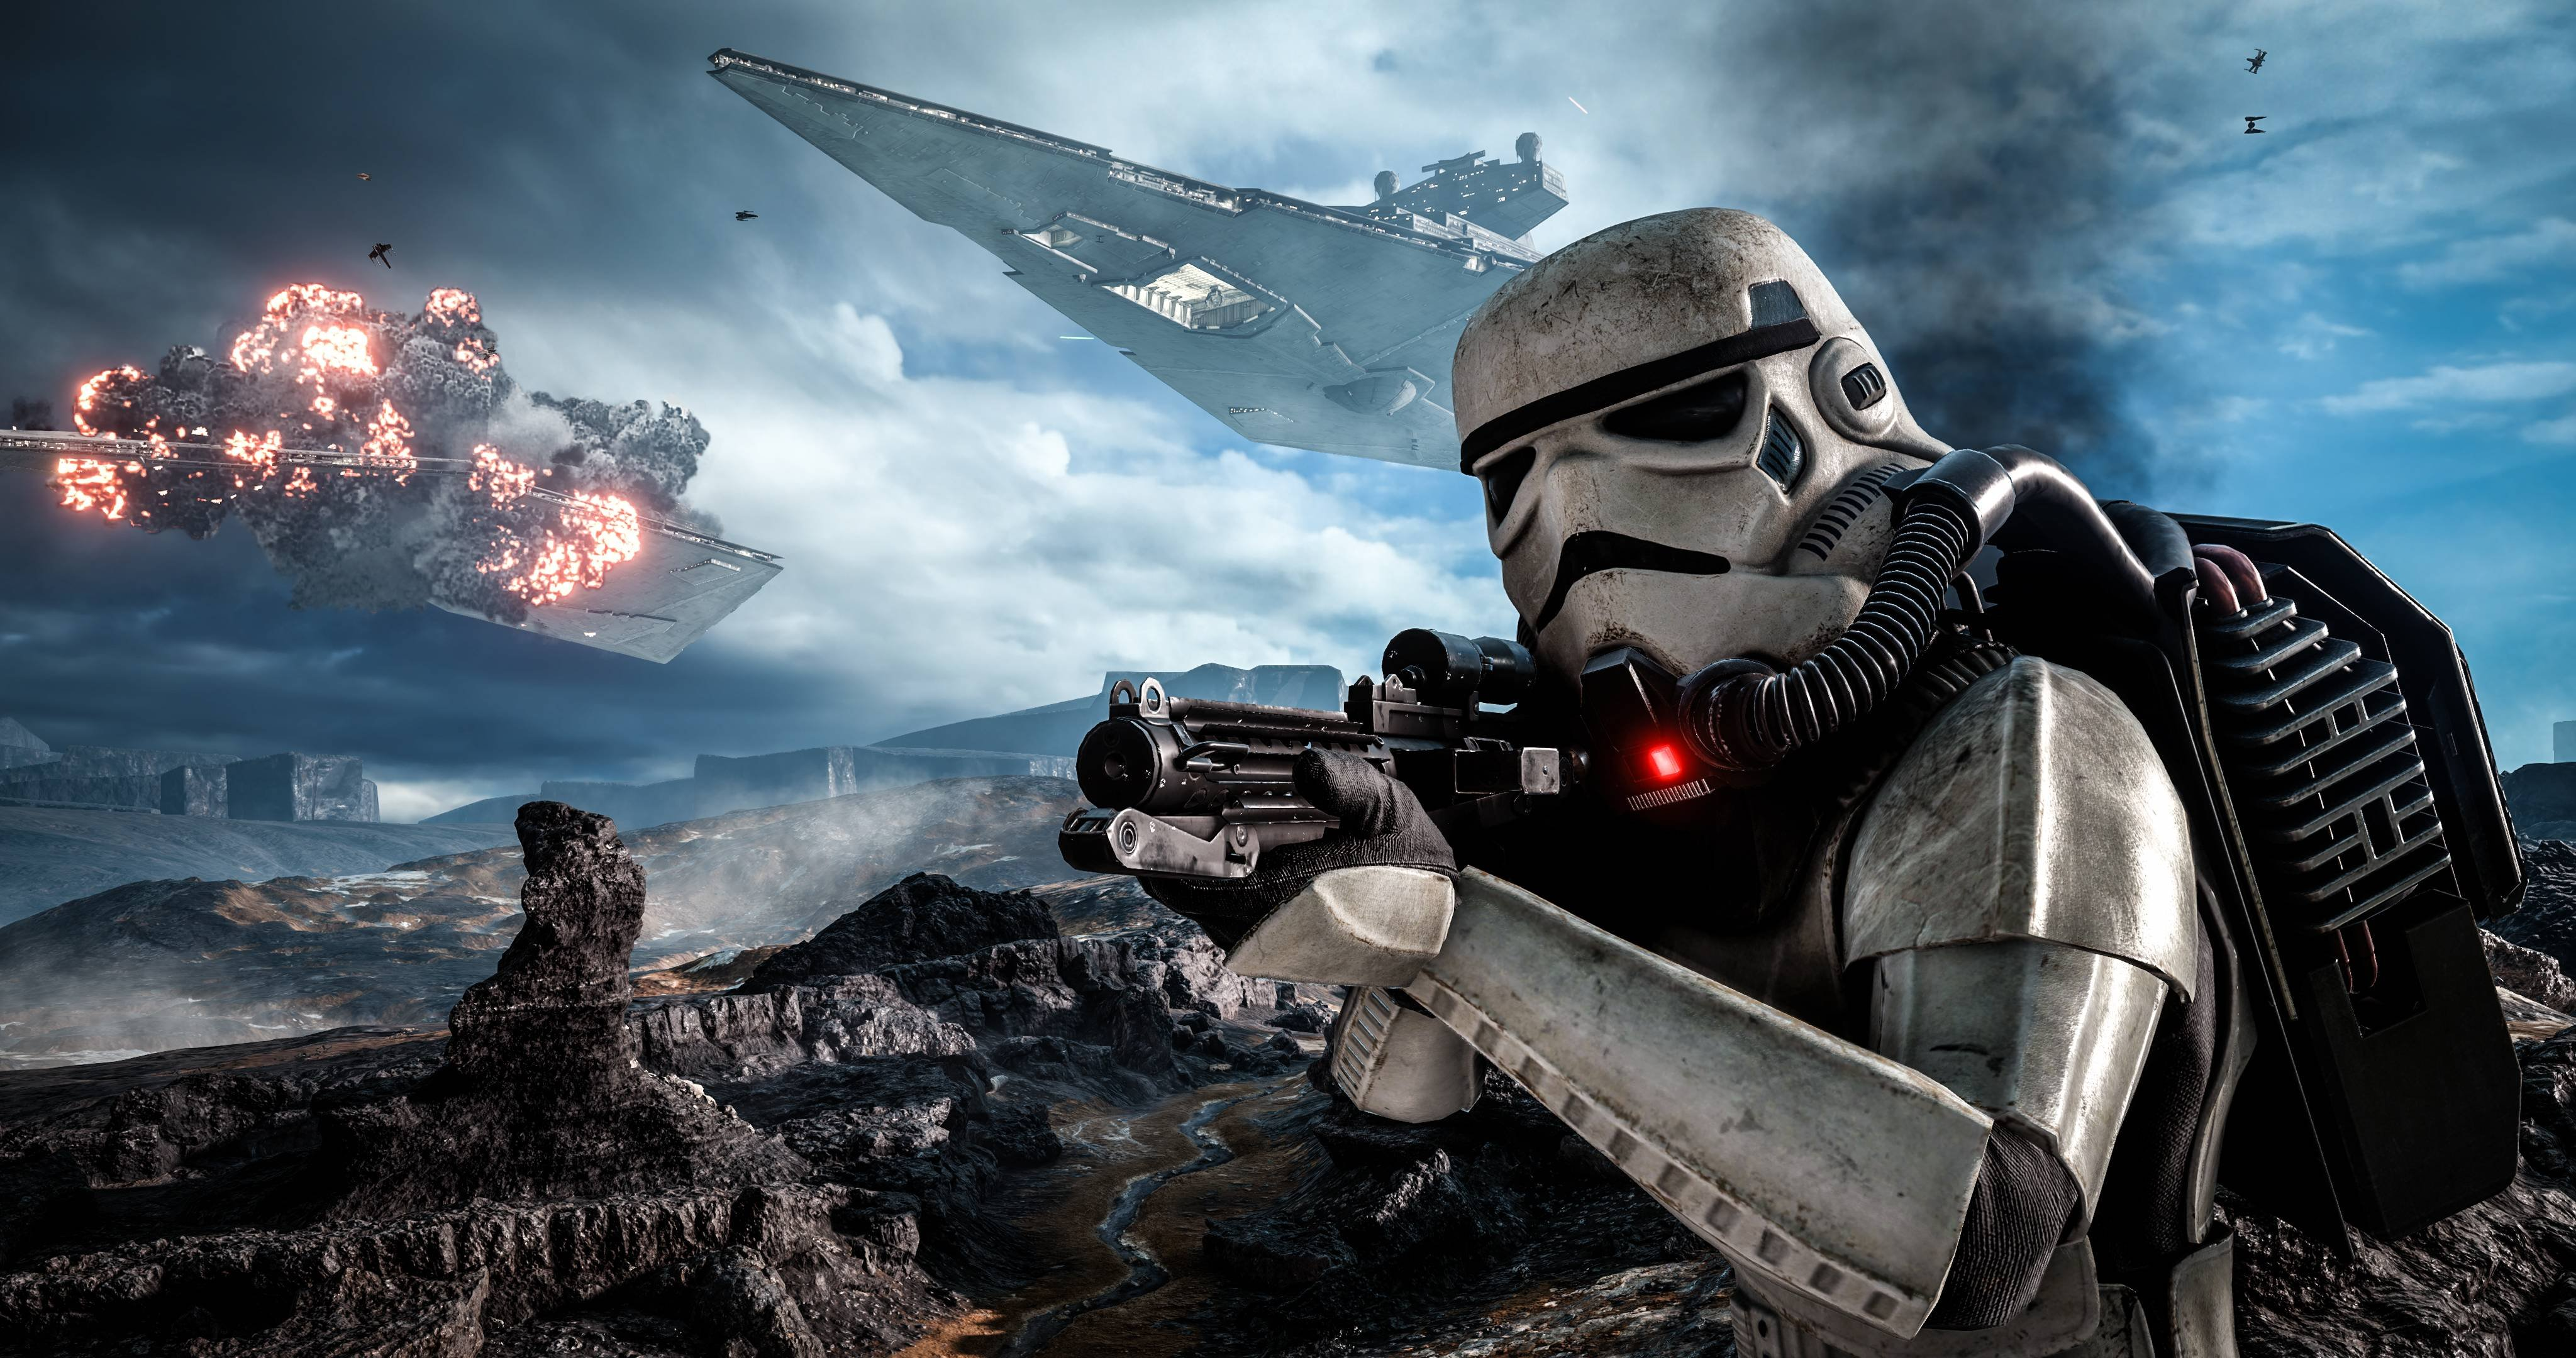 Star wars battlefront sci fi 1swbattlefront action fighting futuristic shooter wallpaper - 4096x2160 wallpaper ...